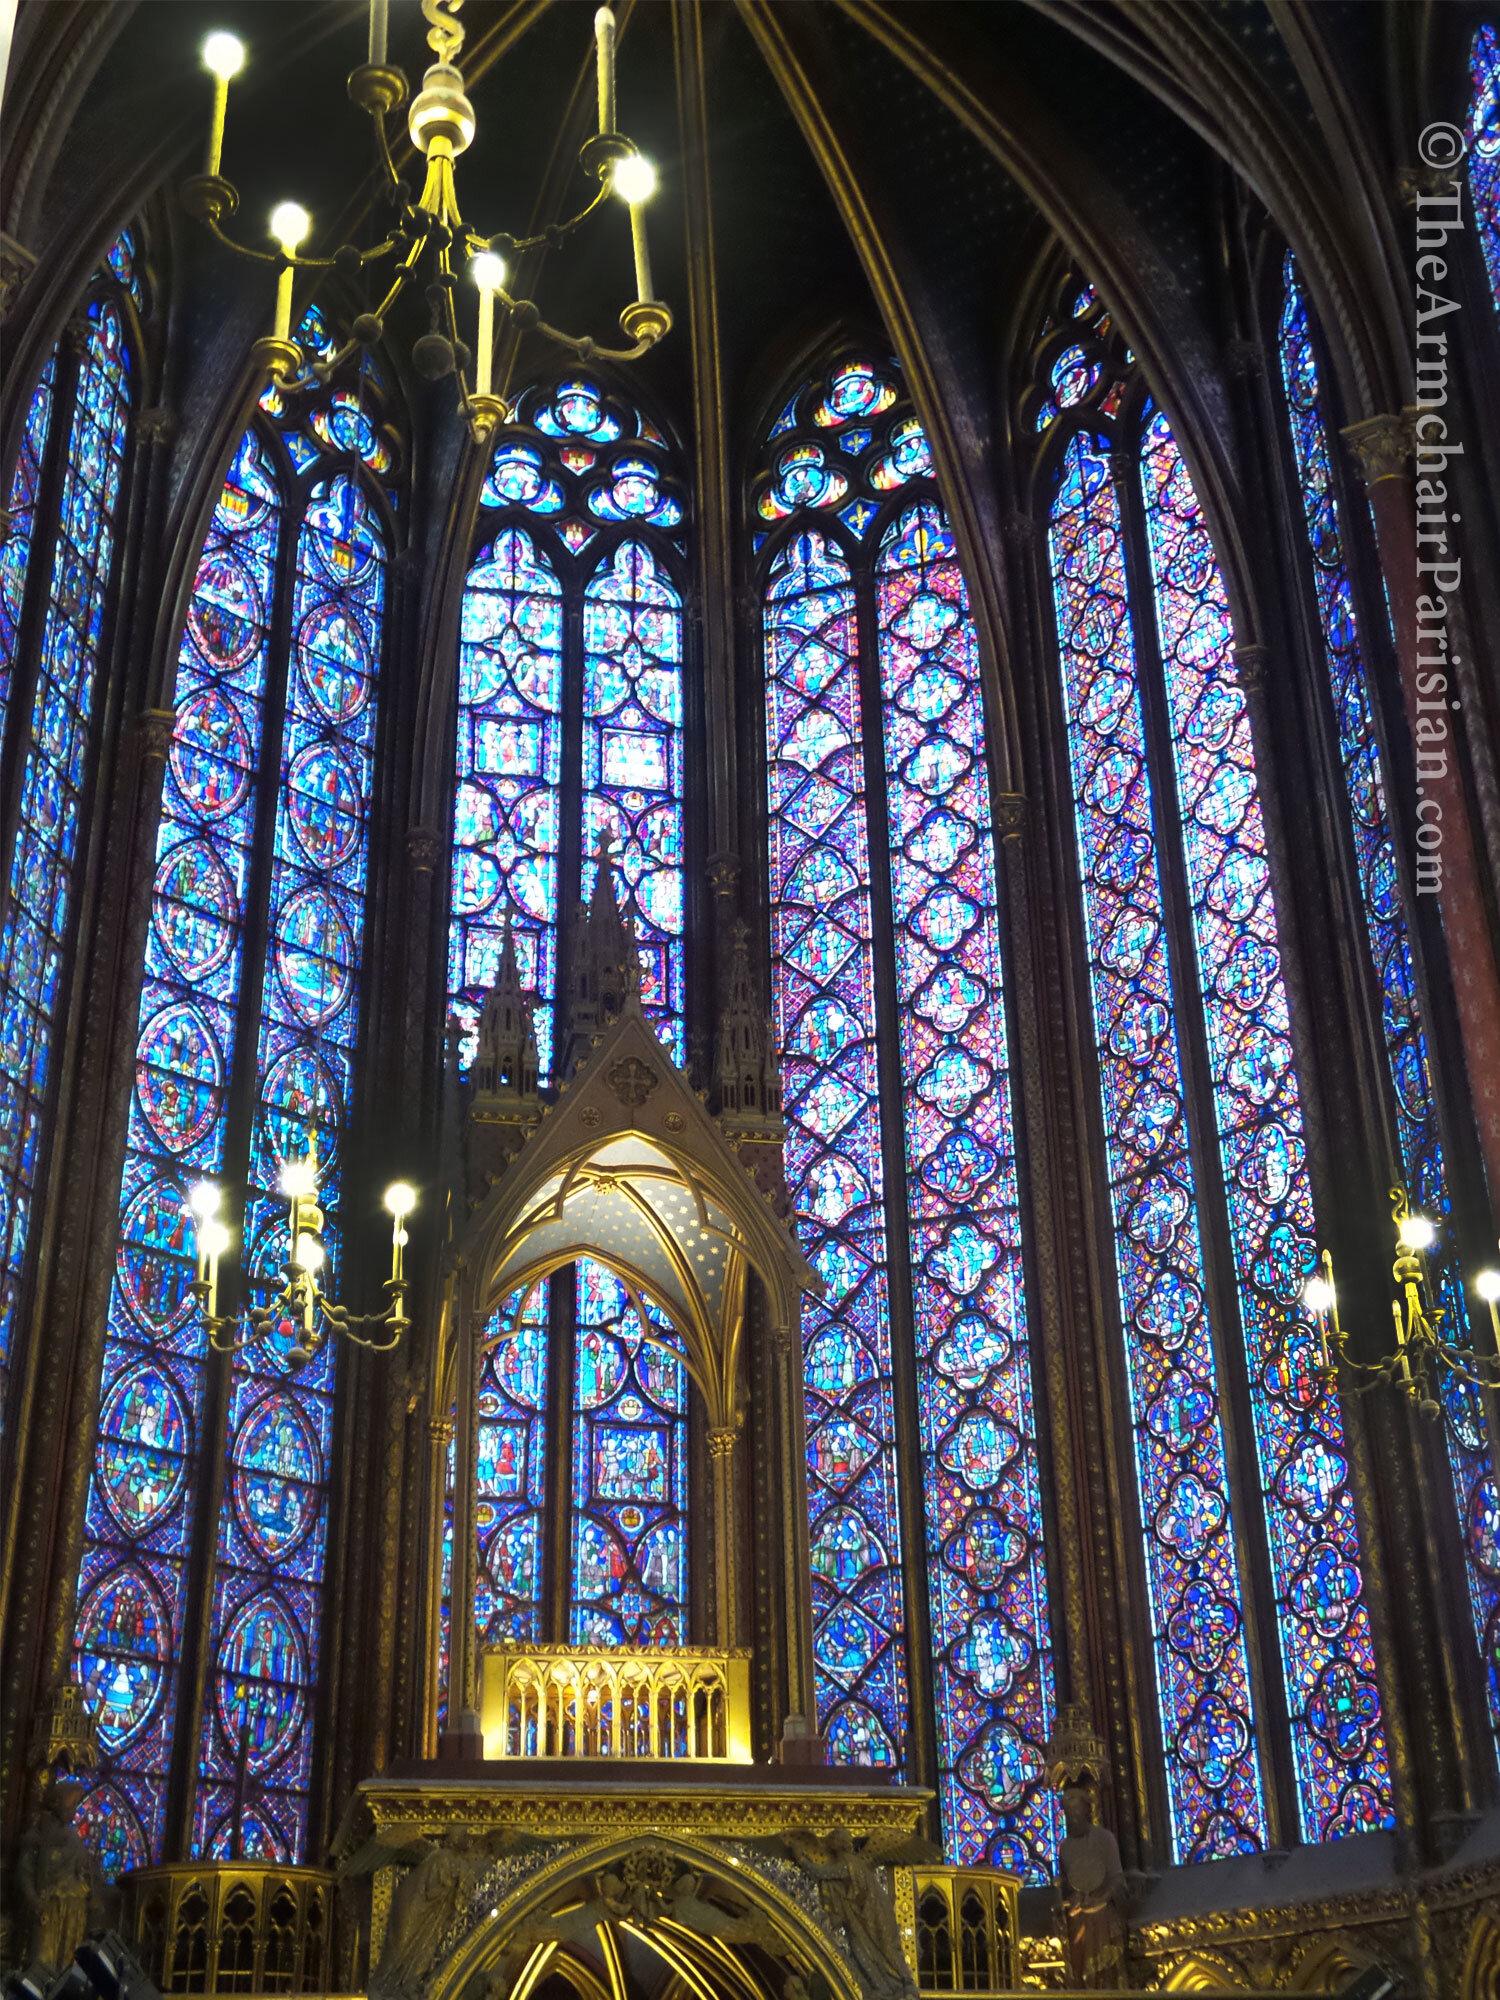 StChapelle_1_Armchair-Parisian.jpg